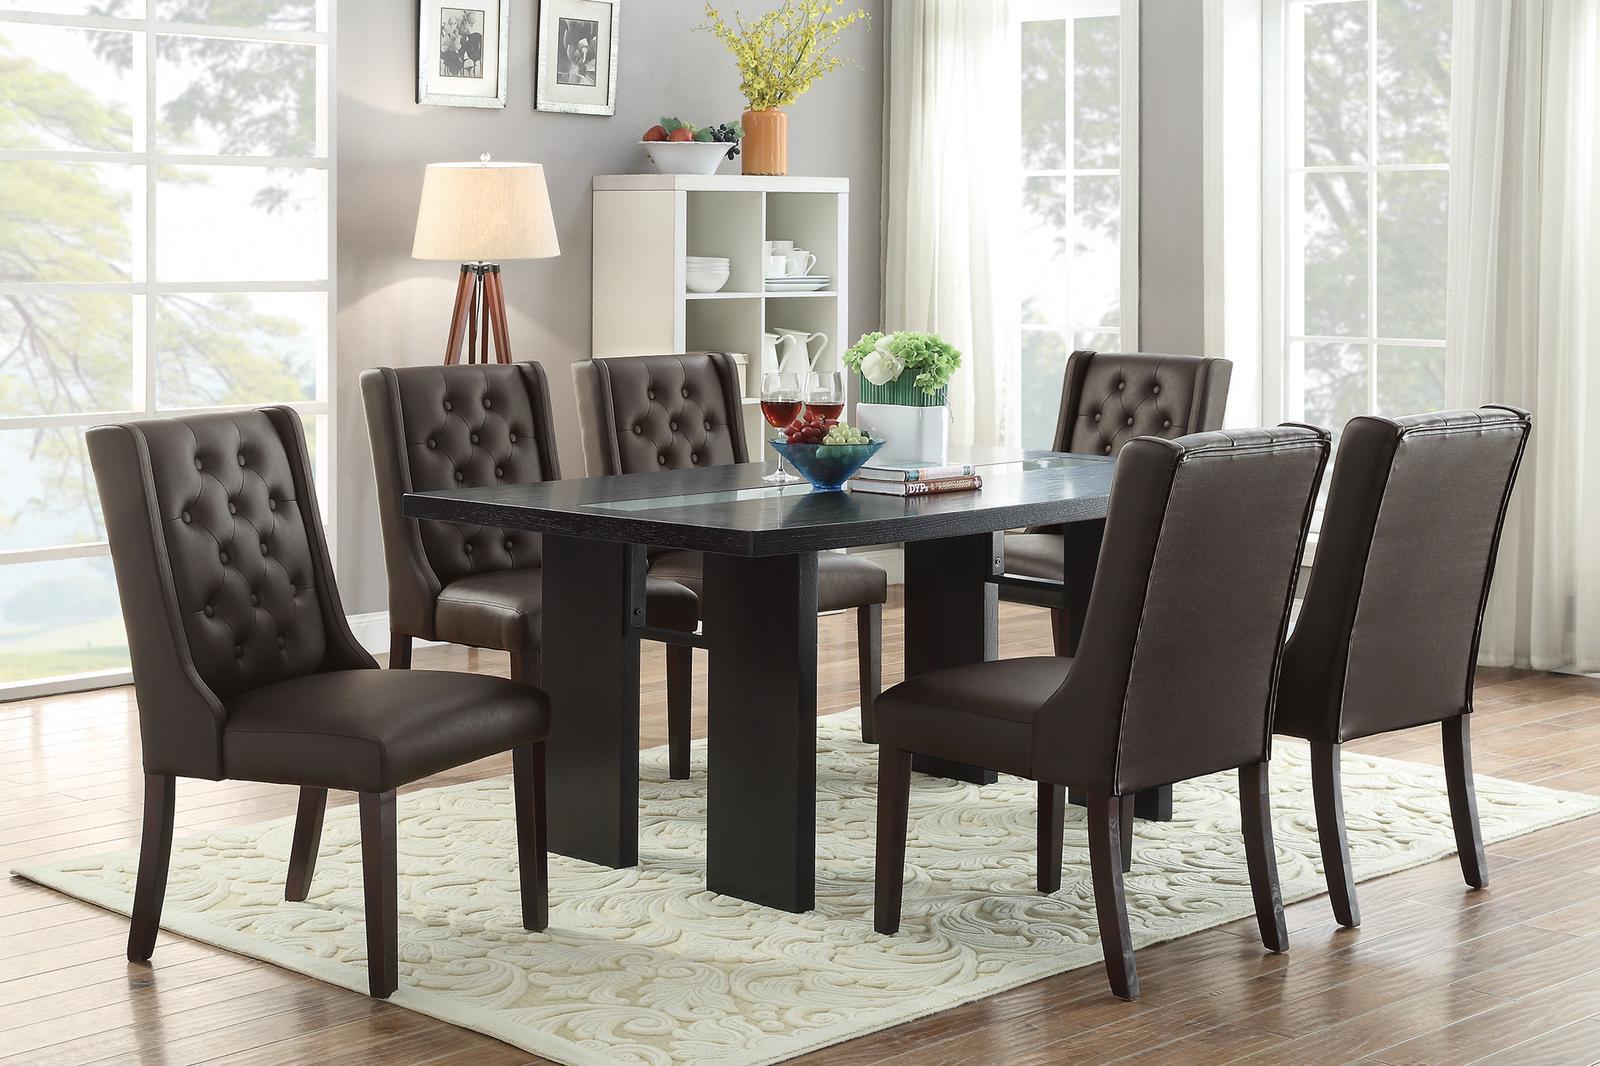 furniture-houston (3)